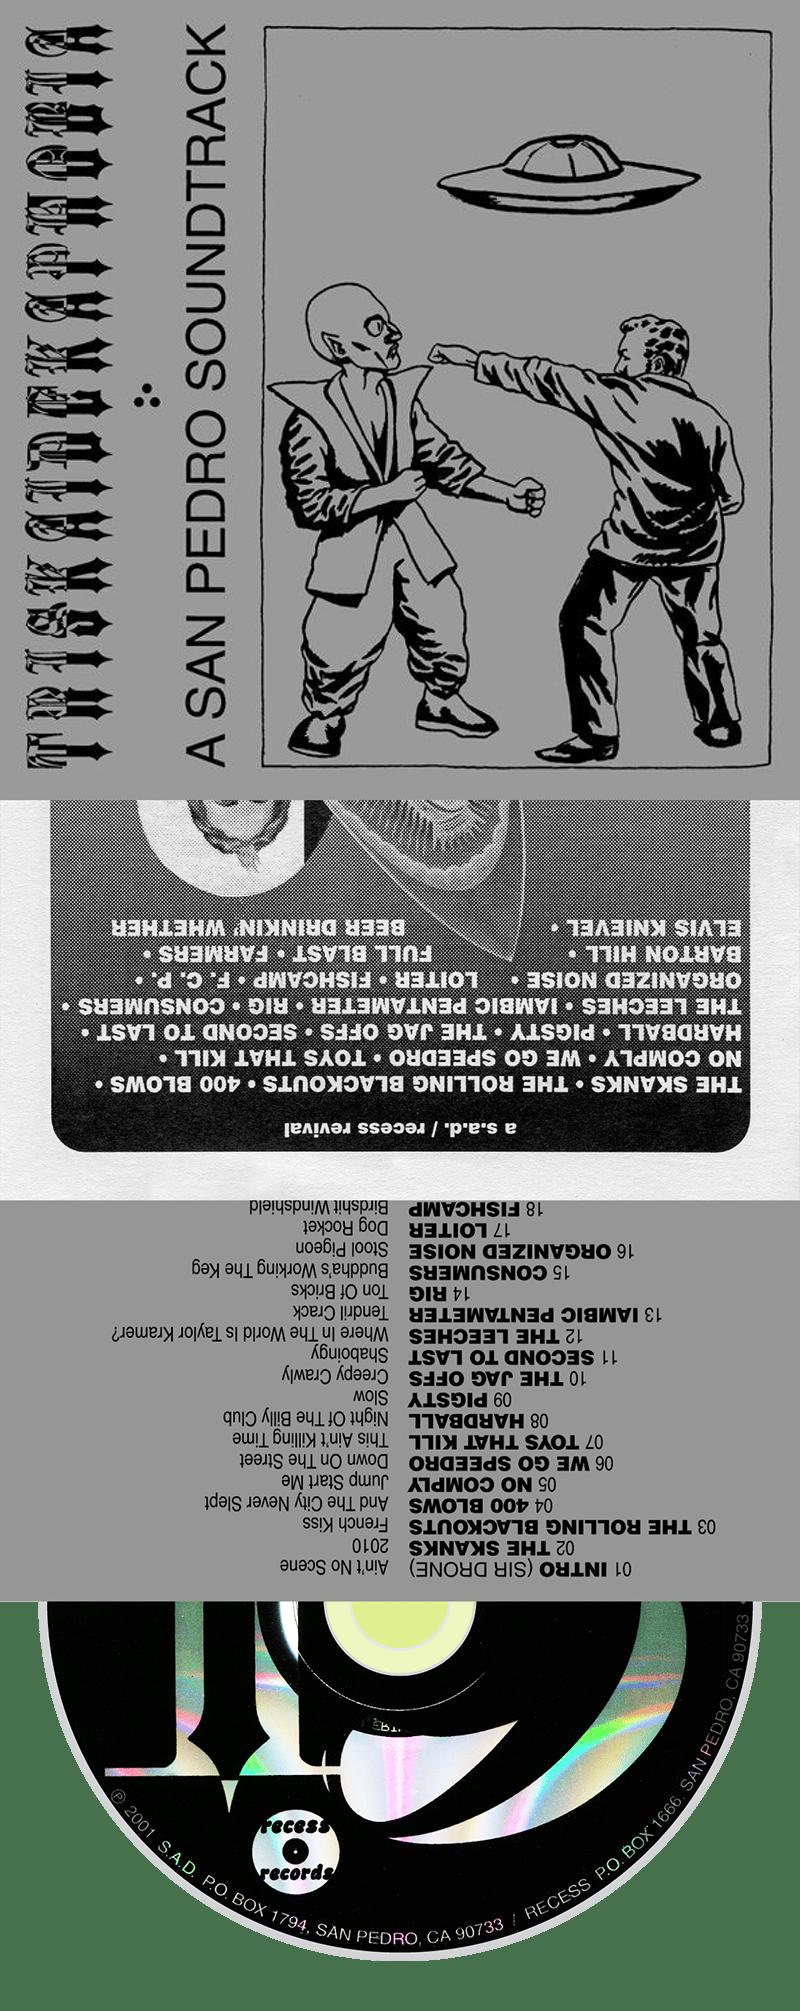 VARIOUS ARTISTS - Triskaidekaphobia: A San Pedro Soundtrack → cd